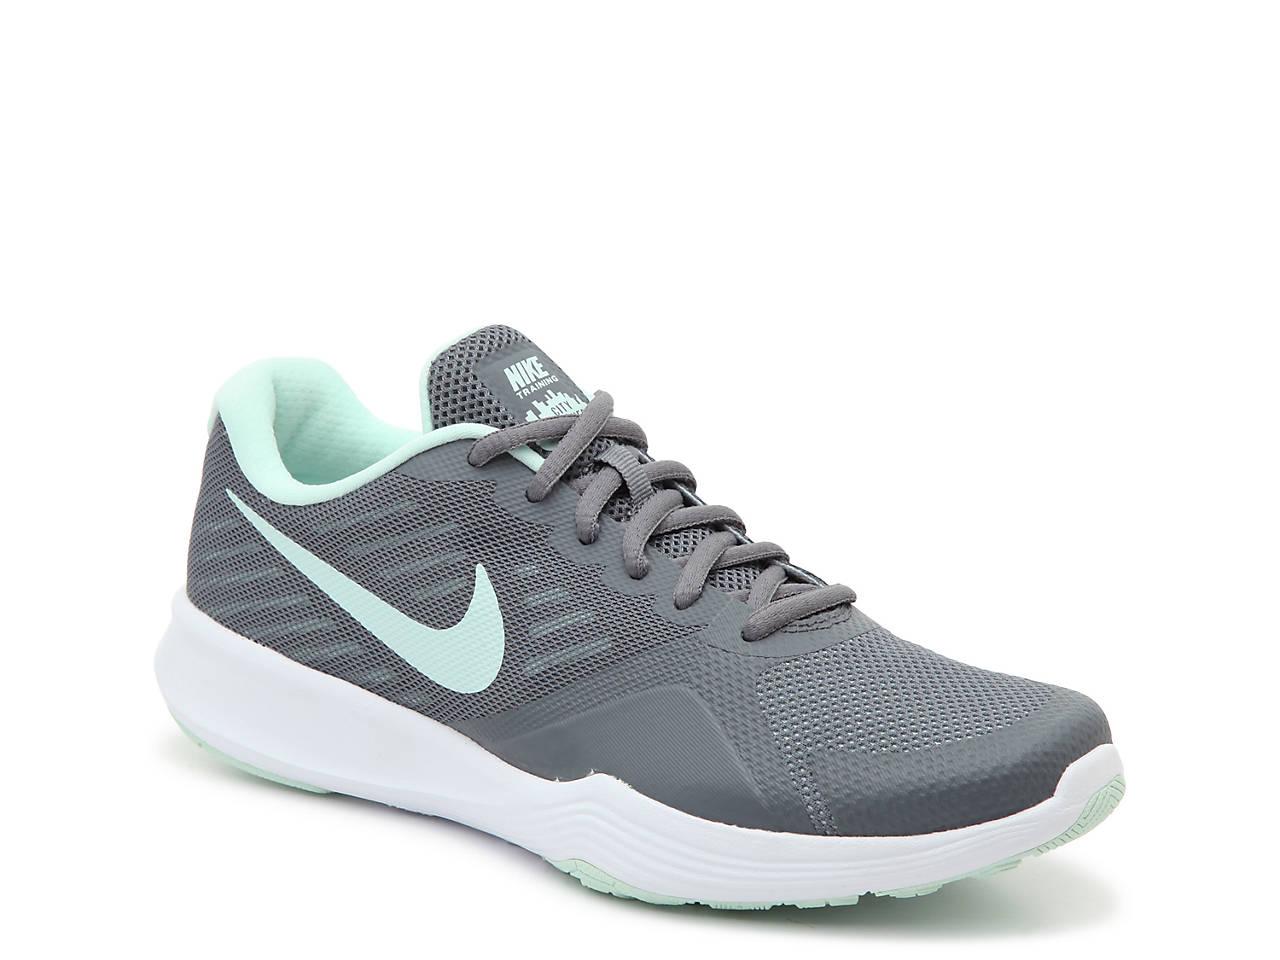 4bcc1fd4aba0 Nike City Trainer Training Shoe - Women s Women s Shoes